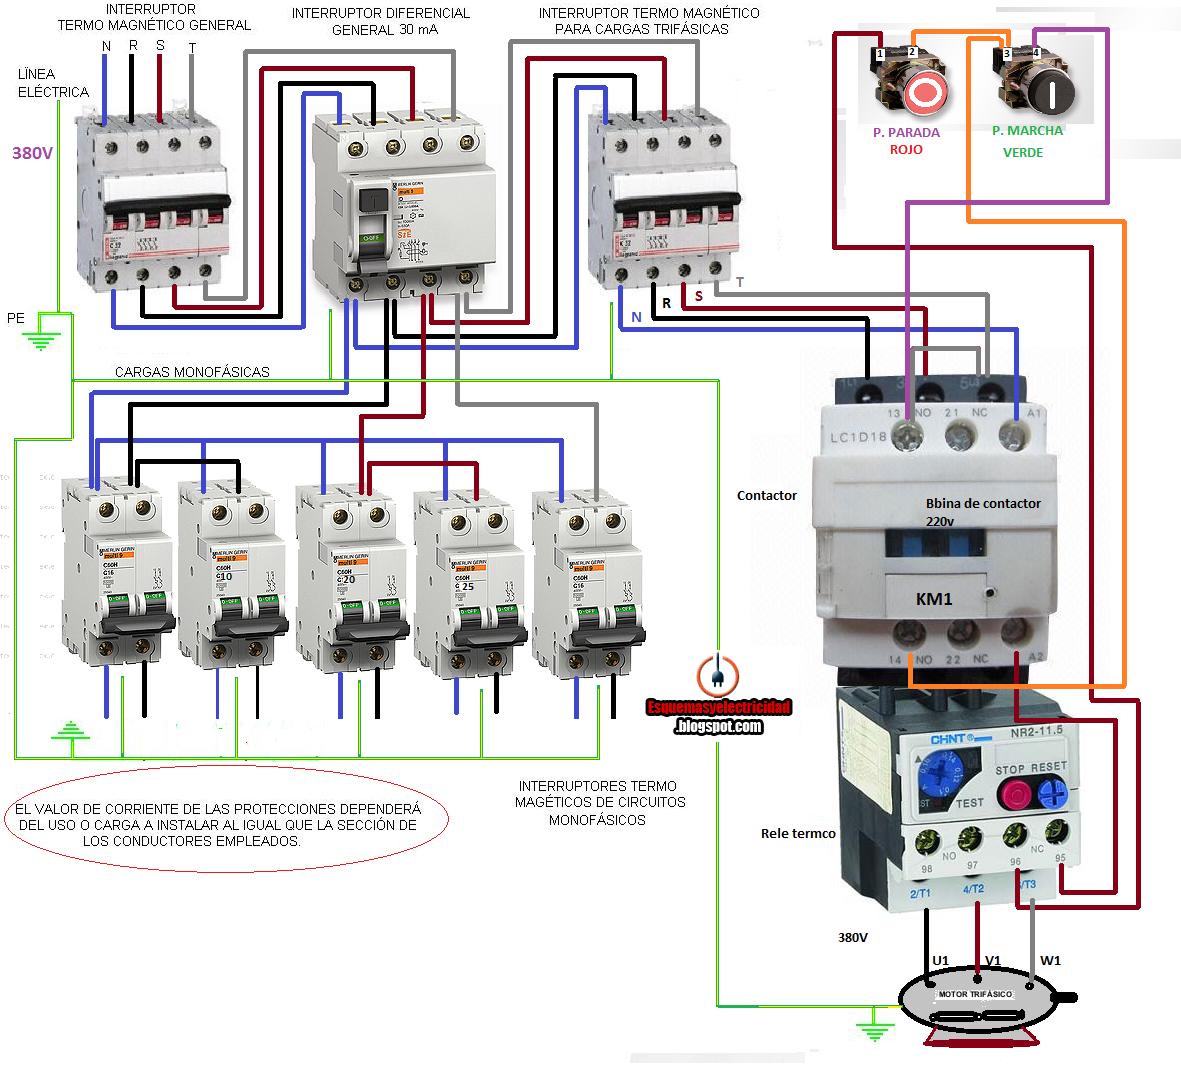 Cuadro electrico trifasico con maniobra marcha paro for Instalacion de piscinas pdf